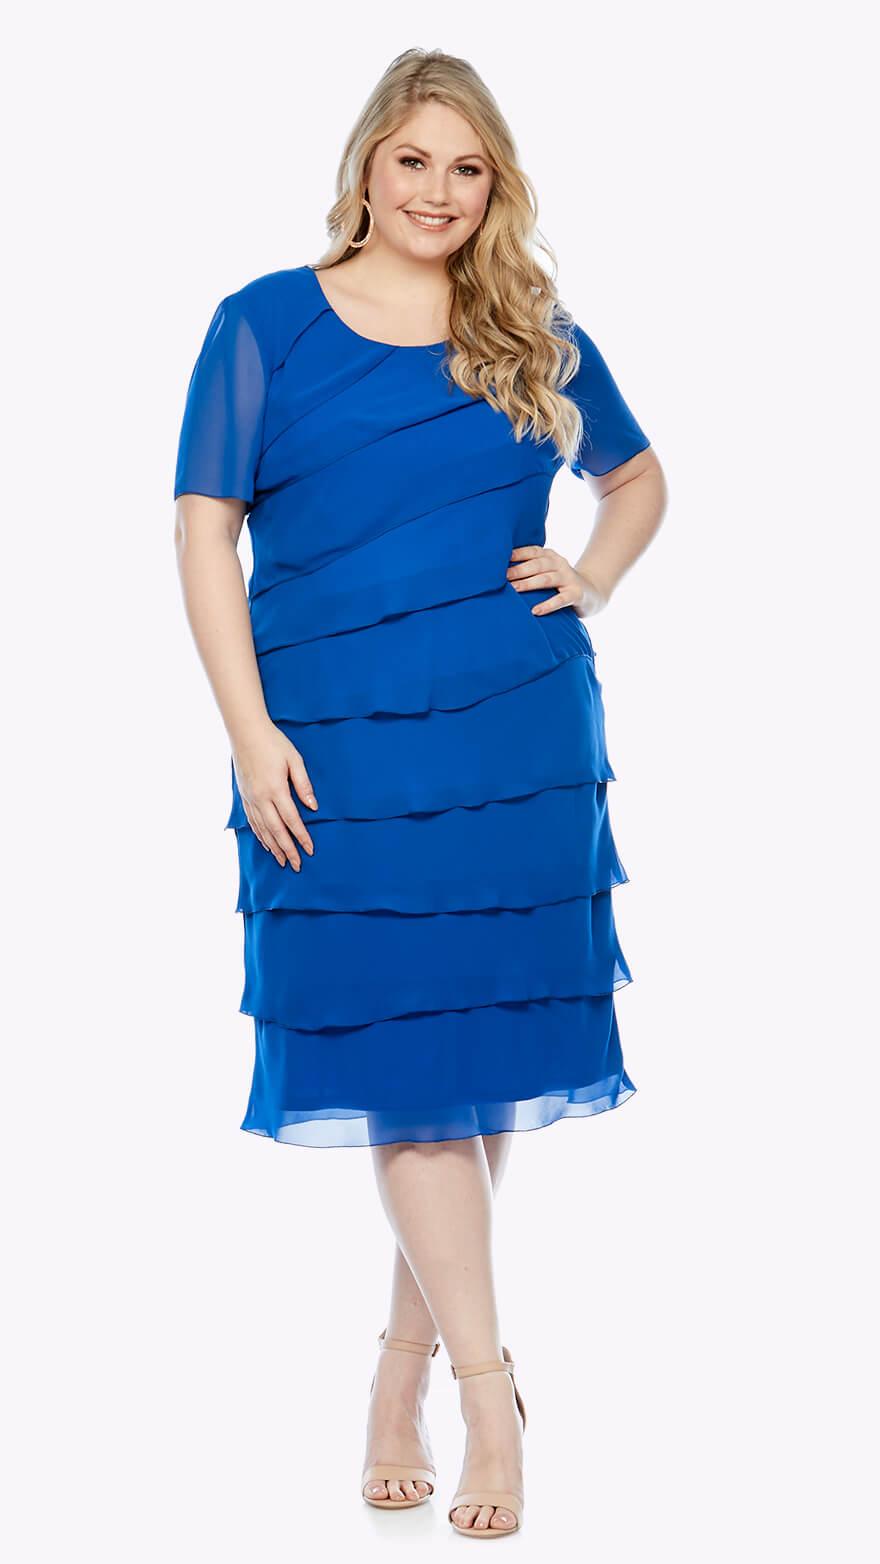 LJ0002 Chiffon layered knee-length dress with short sleeves